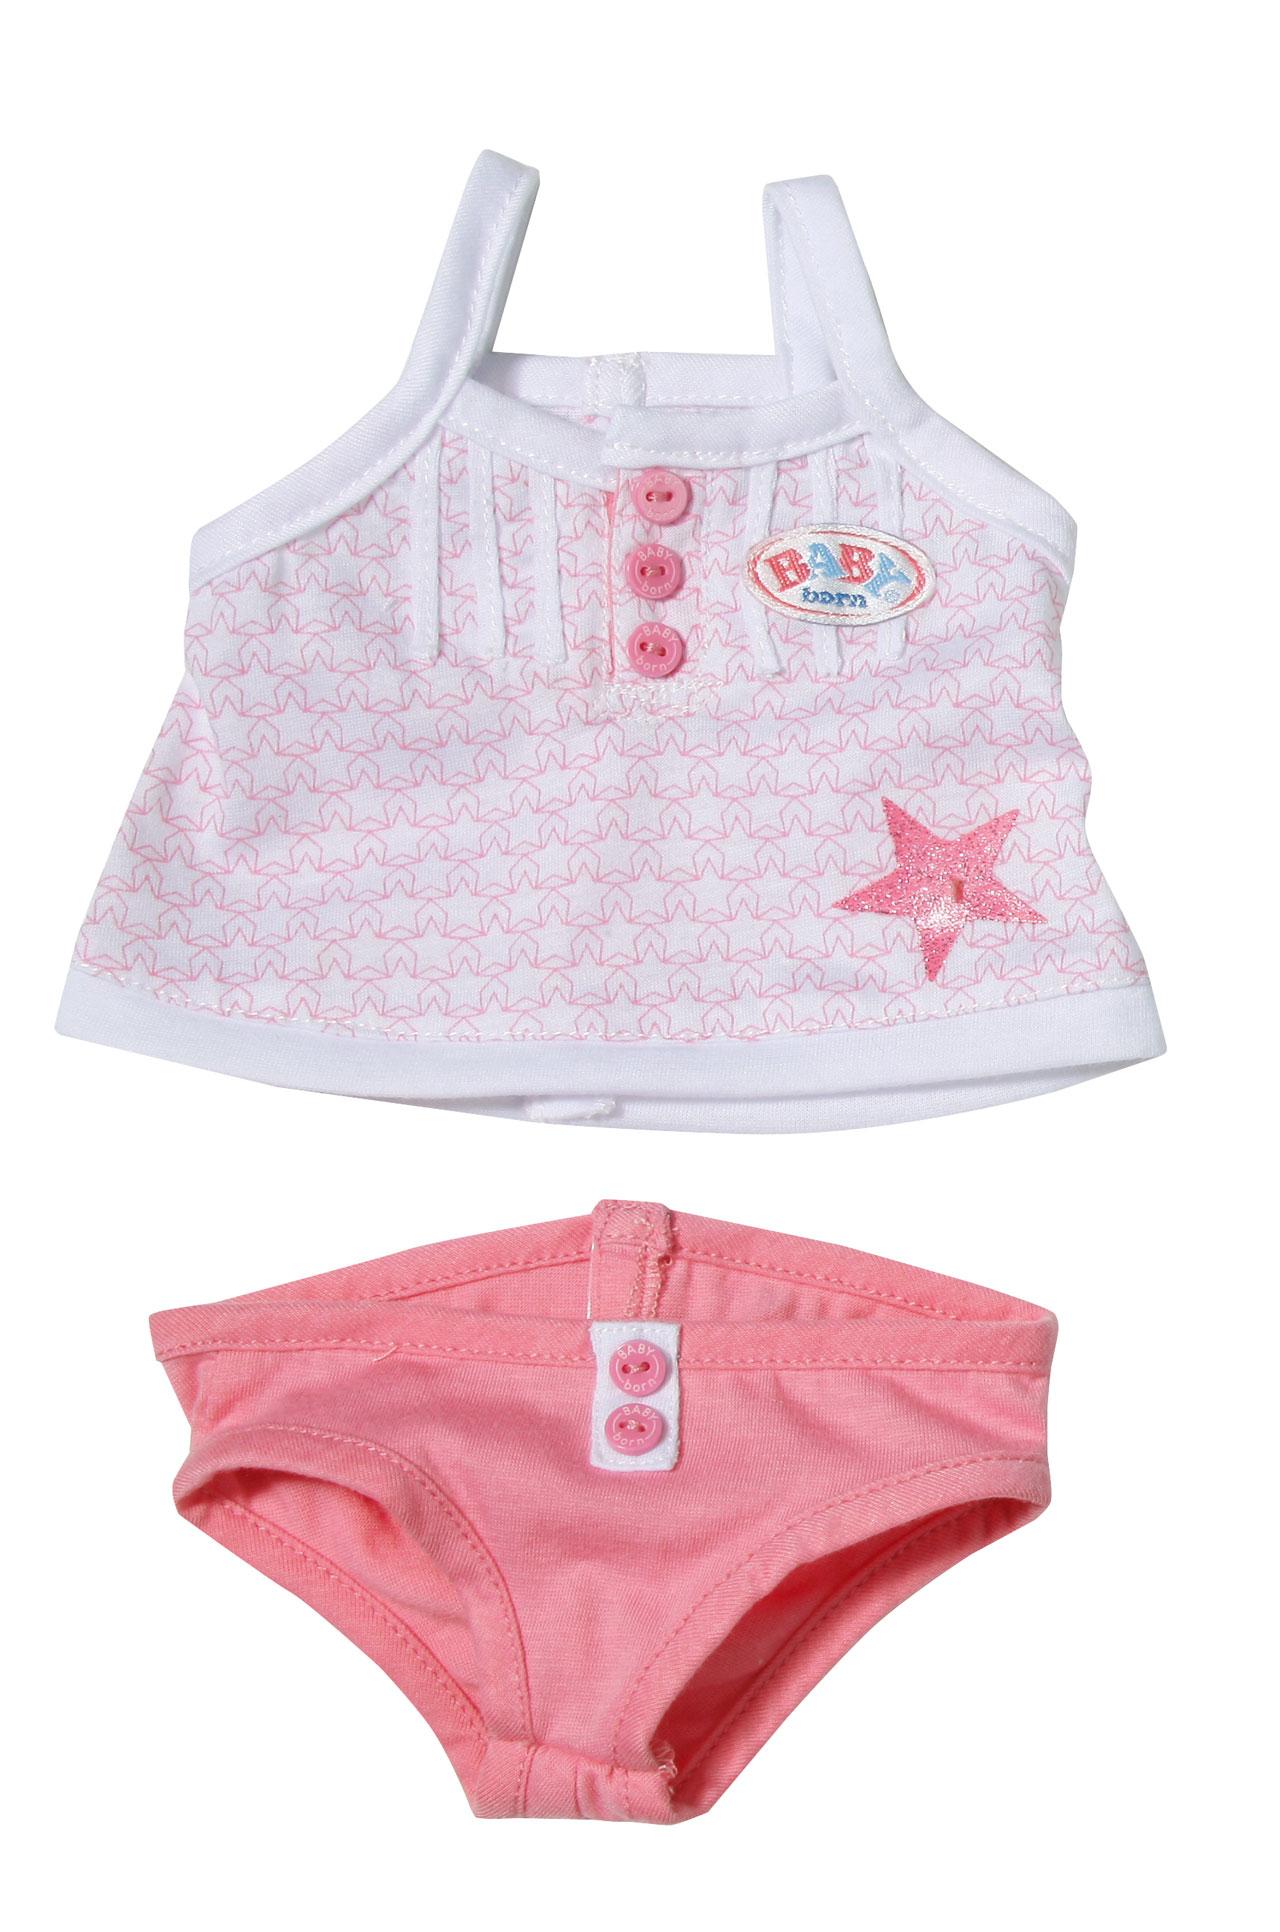 Baby Born Underwear Baby Born Prima Toys